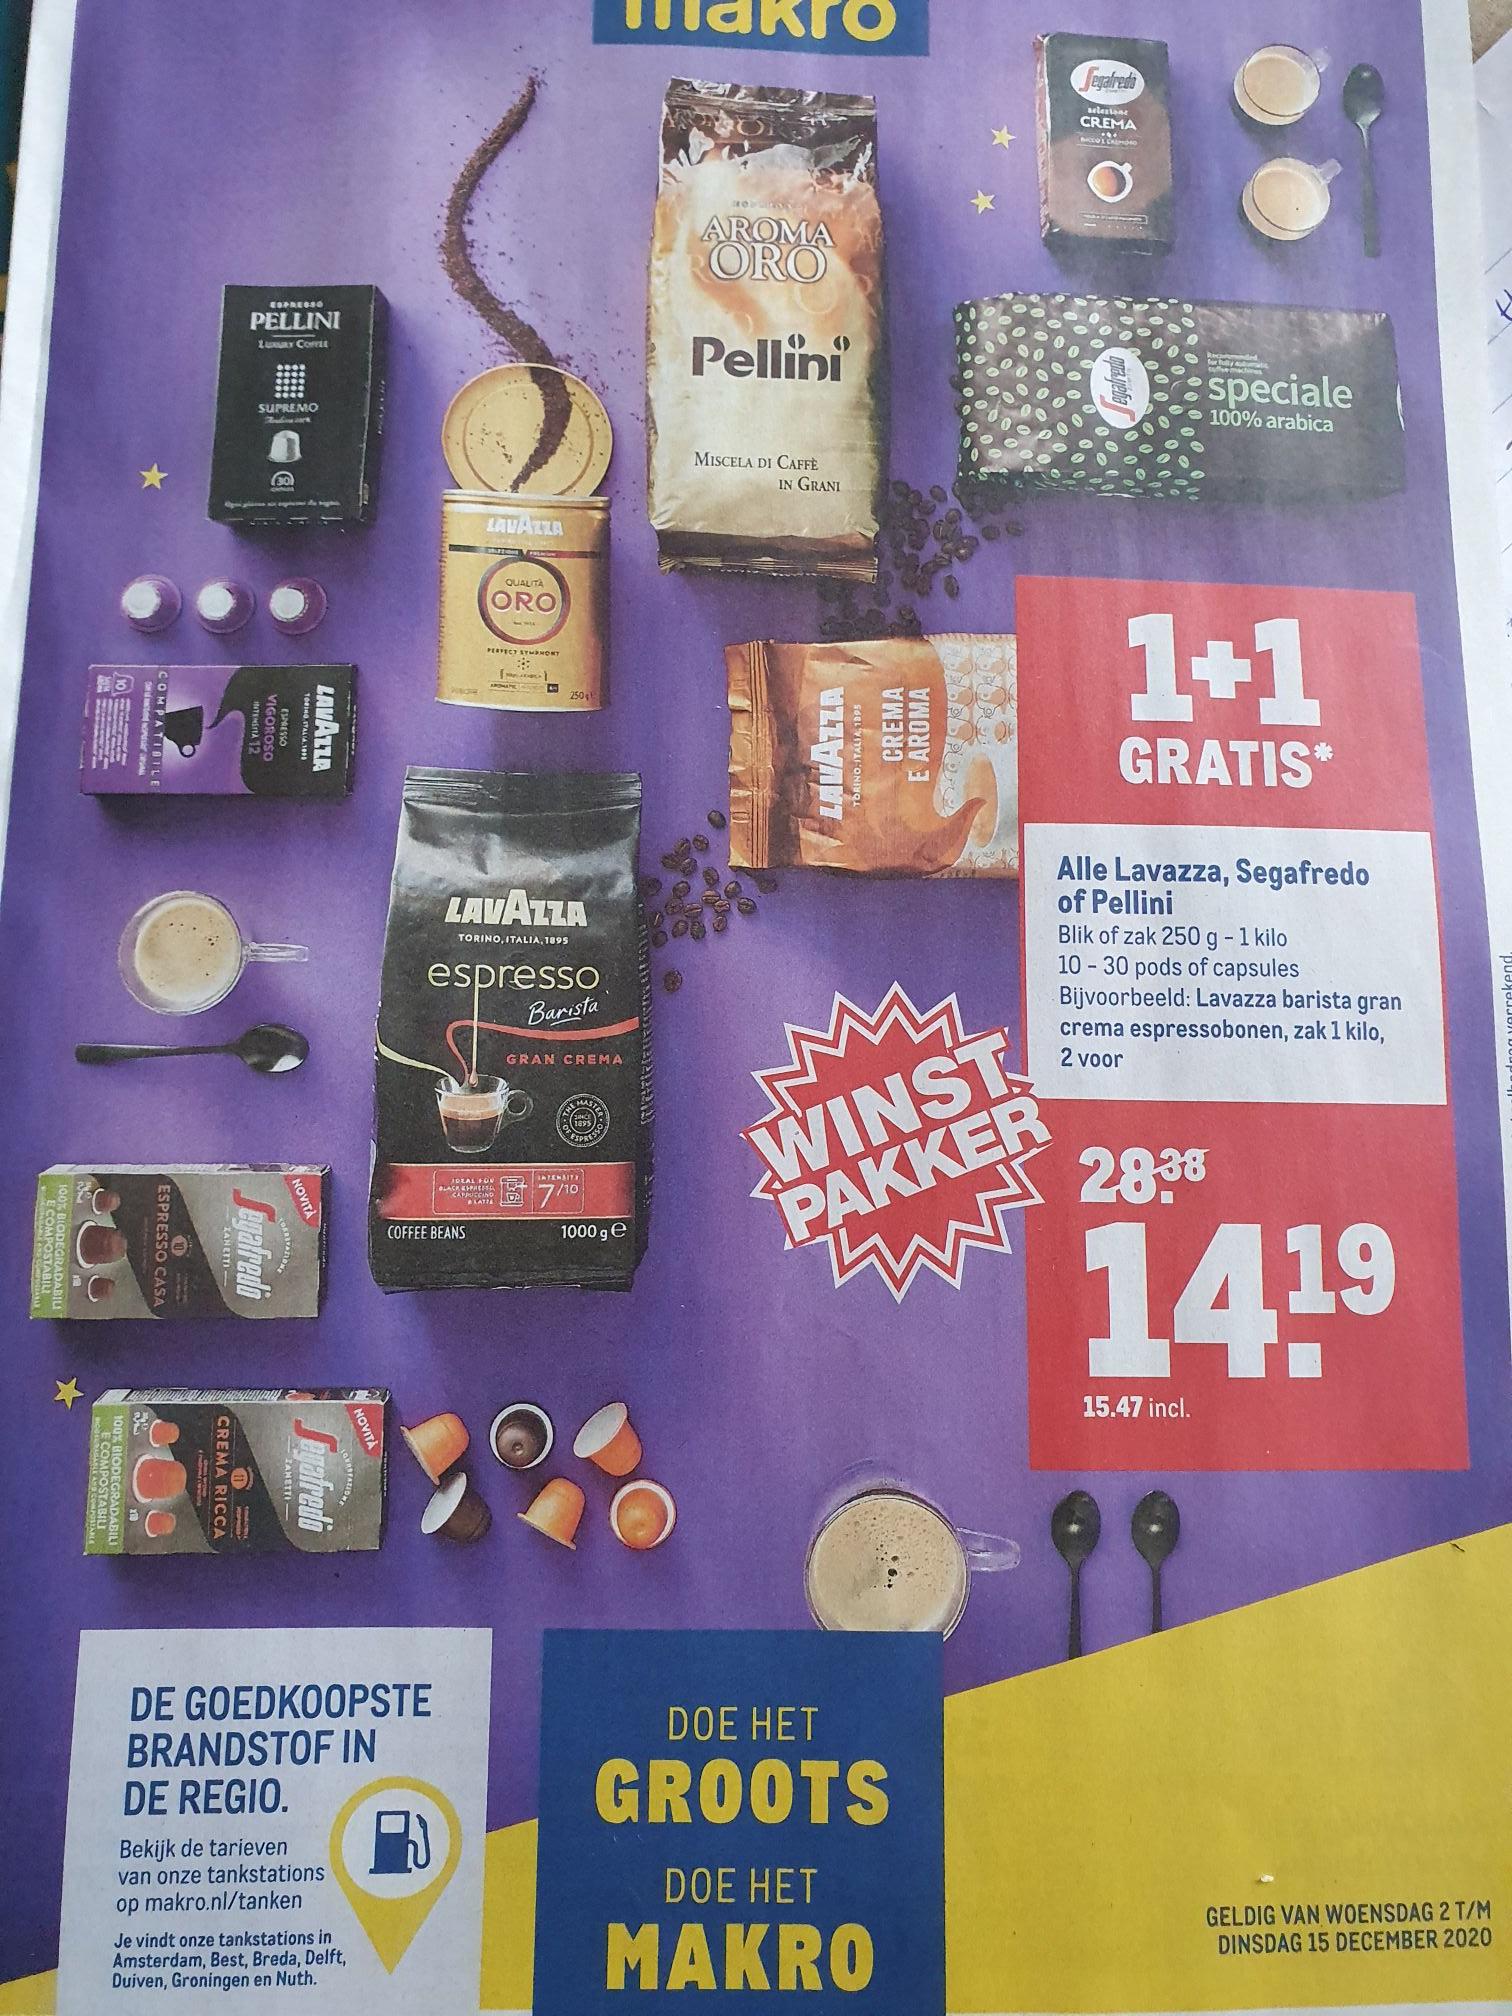 Alle Lavazza, Segafredo of Pellinni 1+1 gratis @Makro